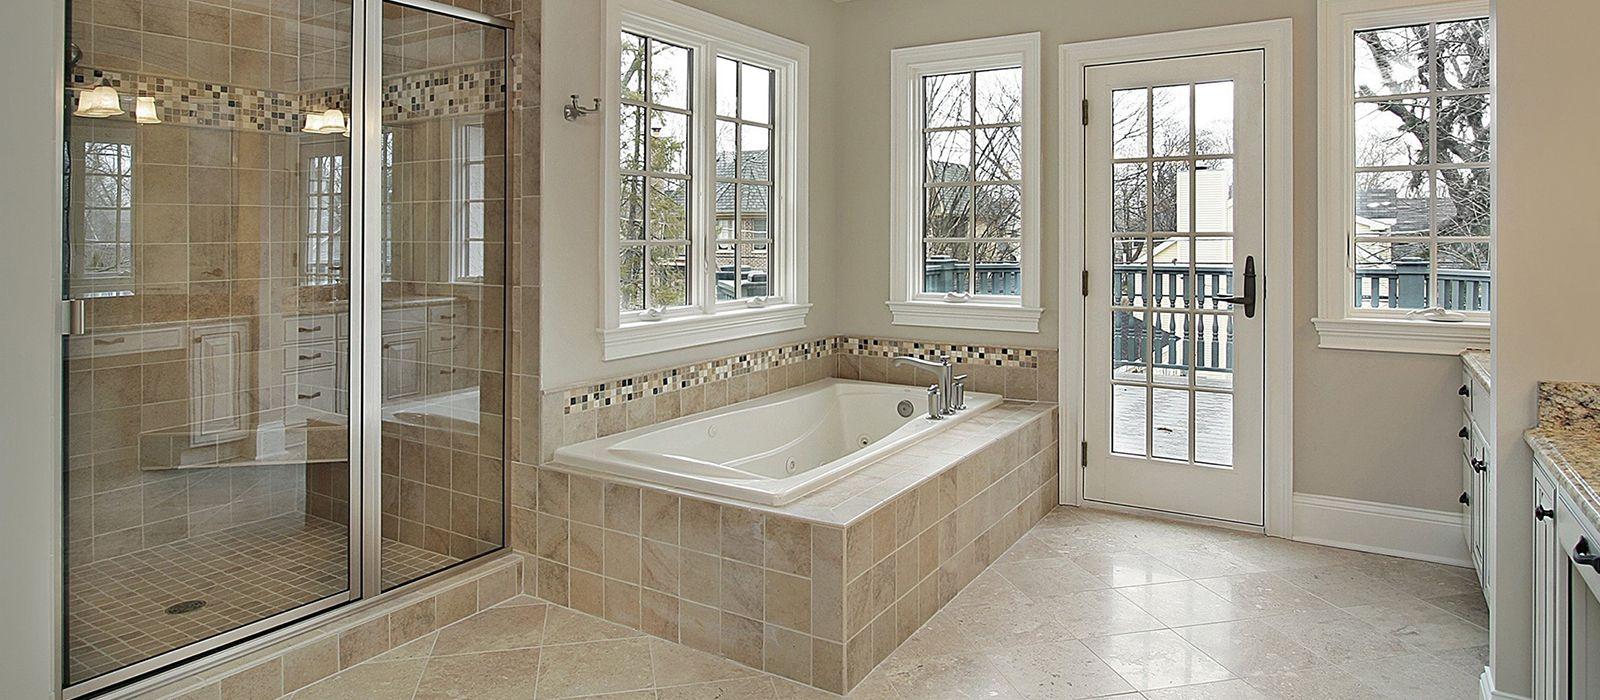 Bathroom, : Archaic Picture Of Walk In Bathtub With Shower Decoration Using  Cream Travertine Porcelain Tile Bathtub Surround Including Sliding Glass  Shower ...